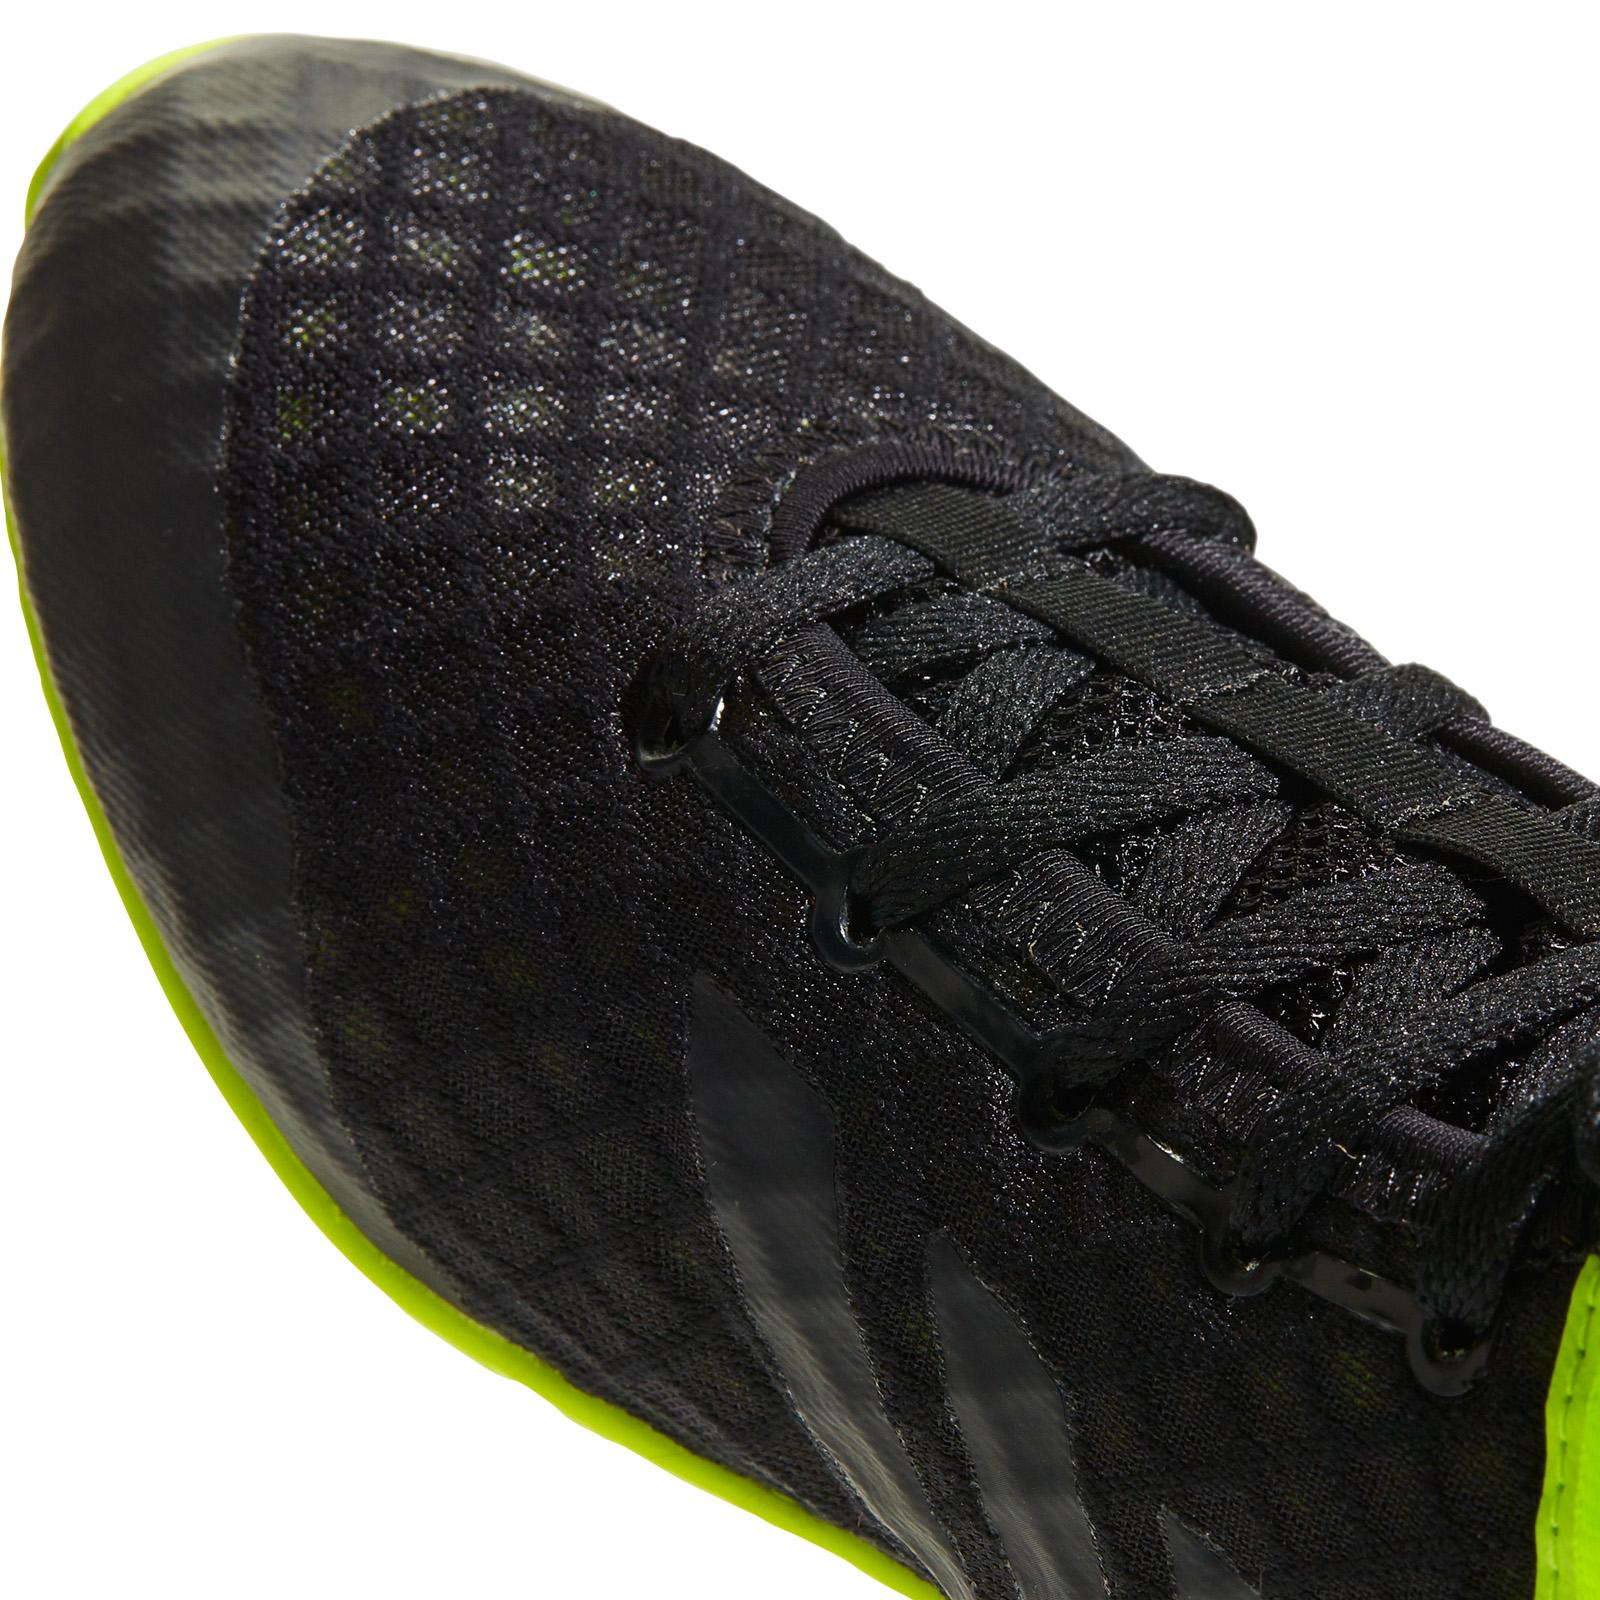 Détails sur Adidas Speedtex 16.1 Hommes Boxe Basket Chaussures Bottes NoirVert UK 7.5